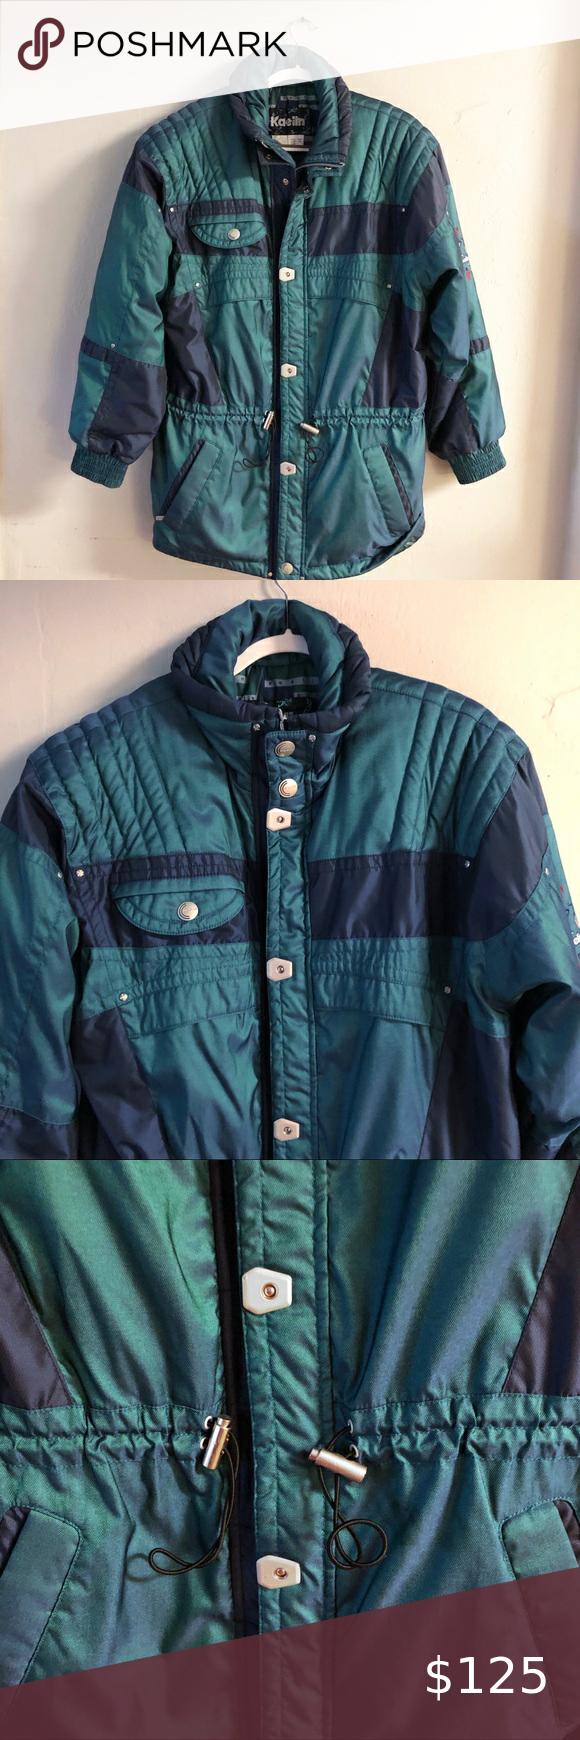 Vintage 1990/'s Peppermint Striped Seersucker Spring Jacket